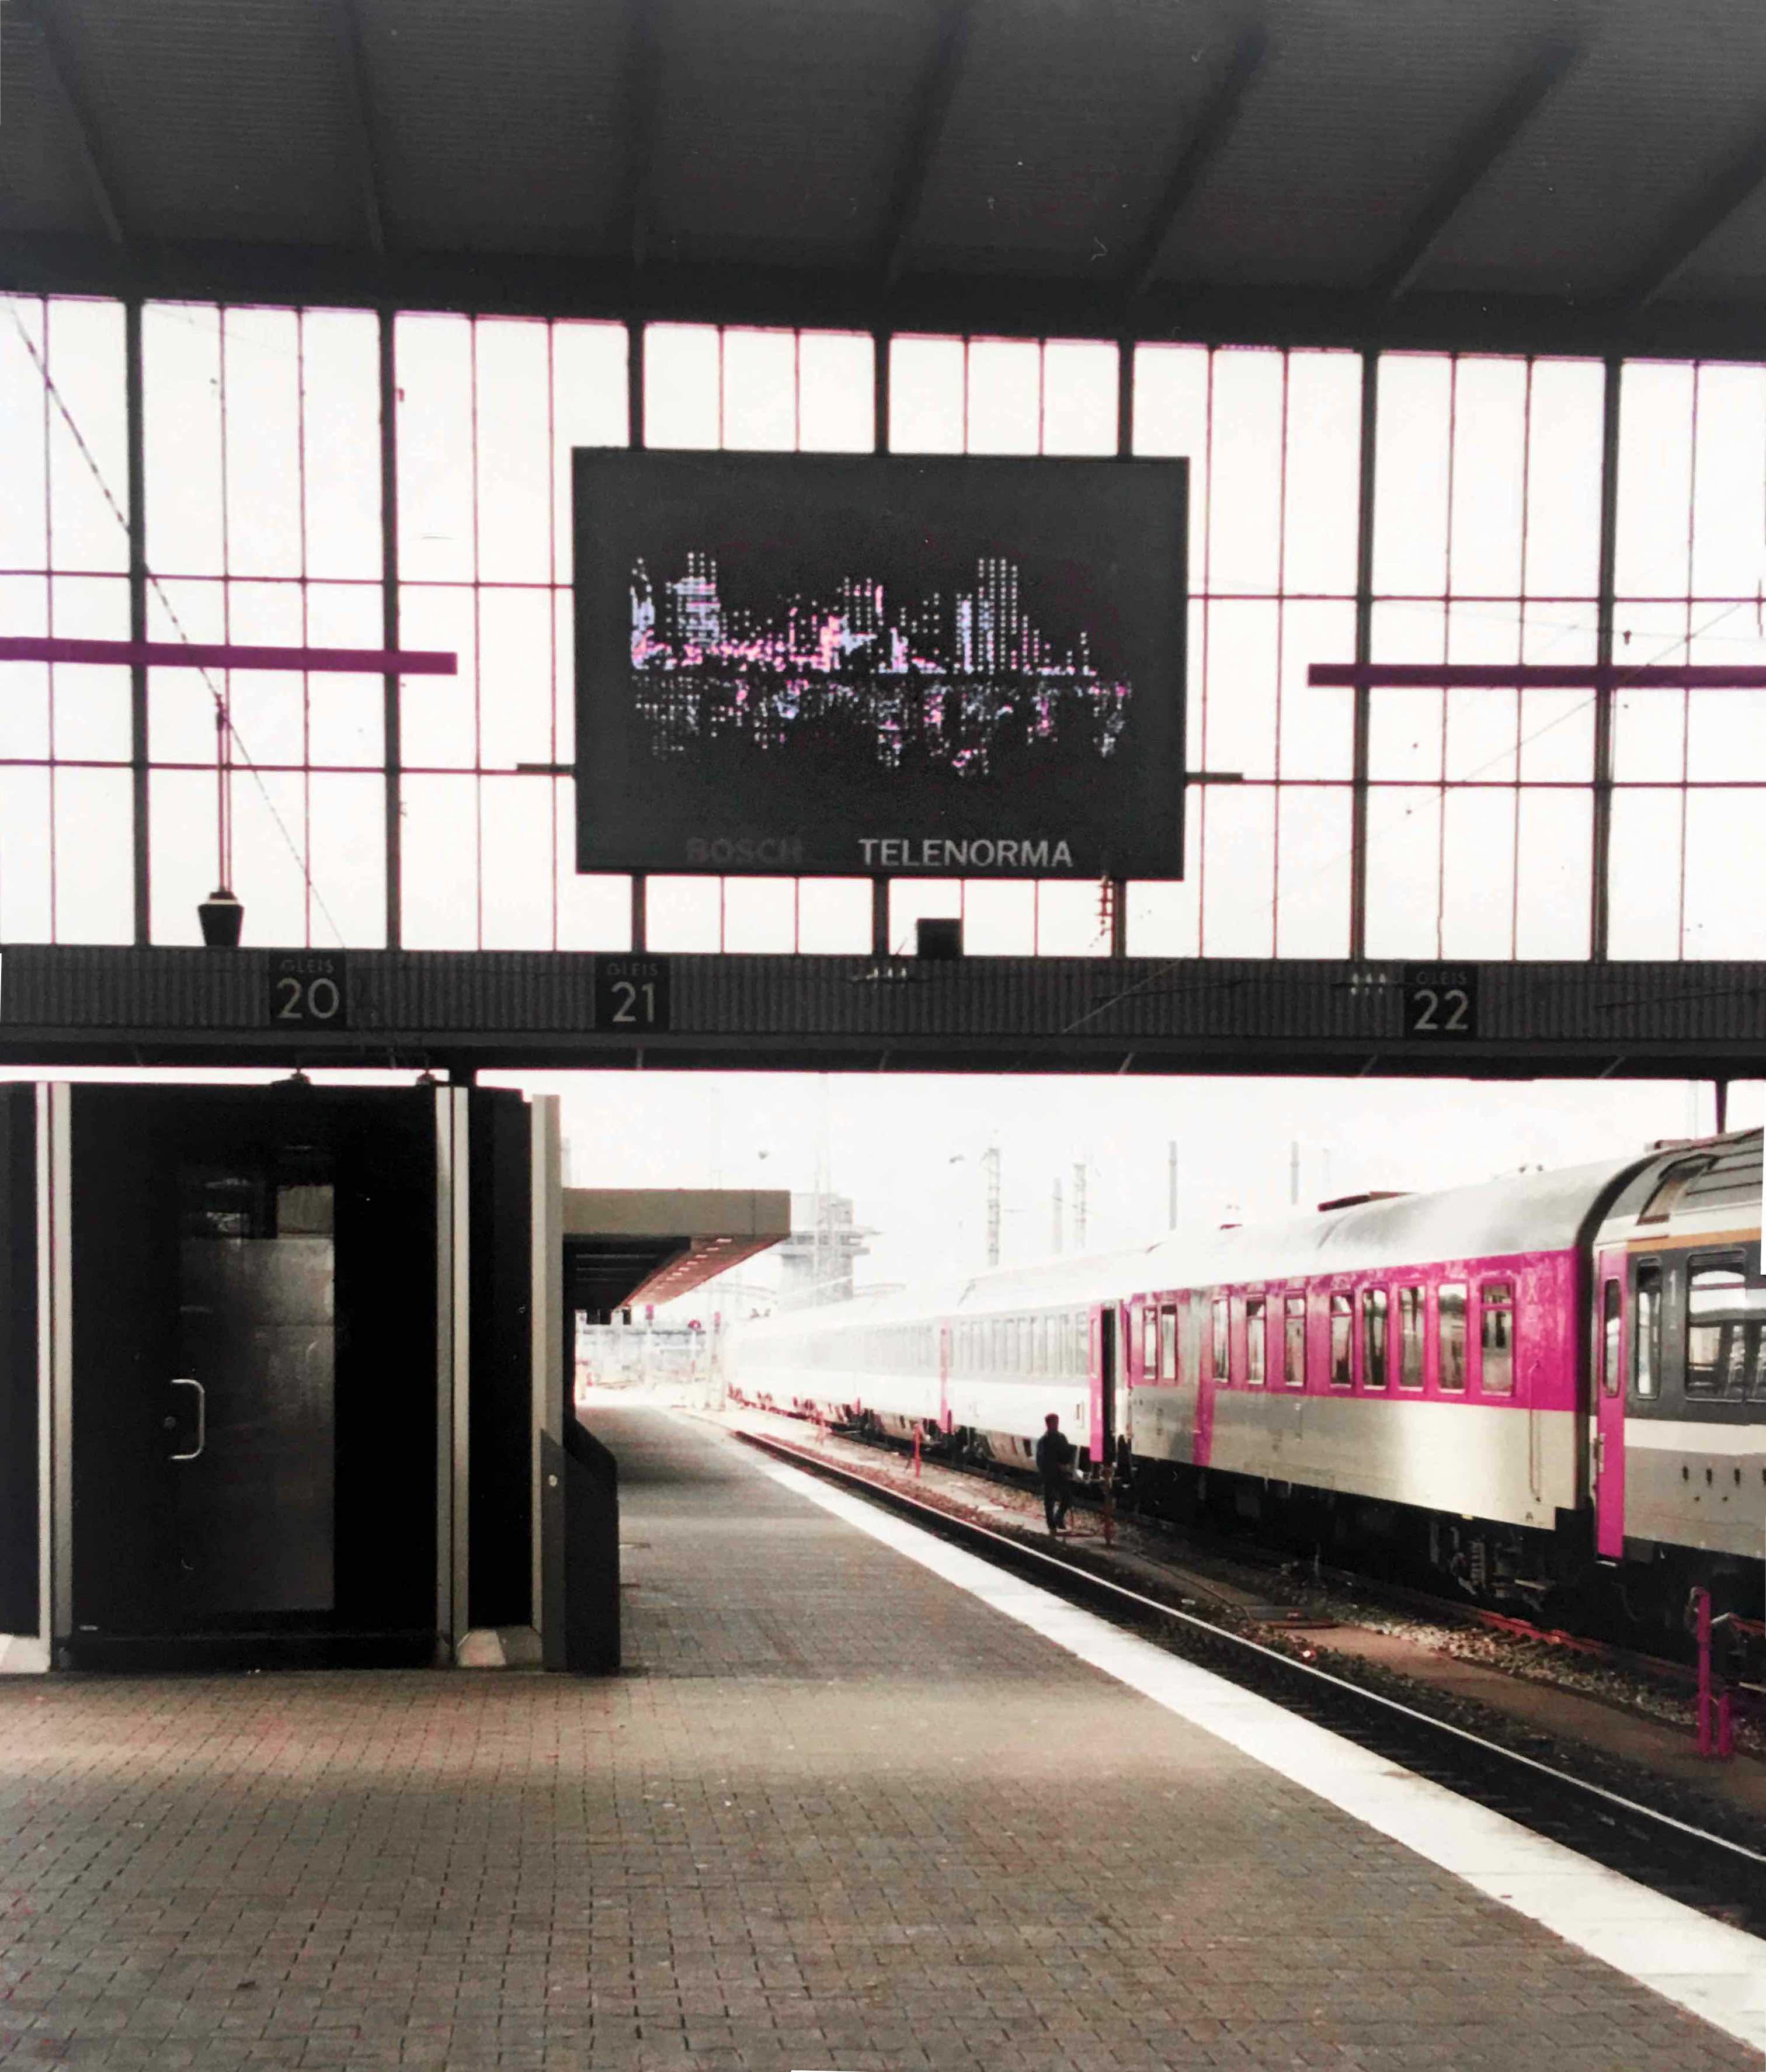 stadt am wasser, led-screen, münchen 1993